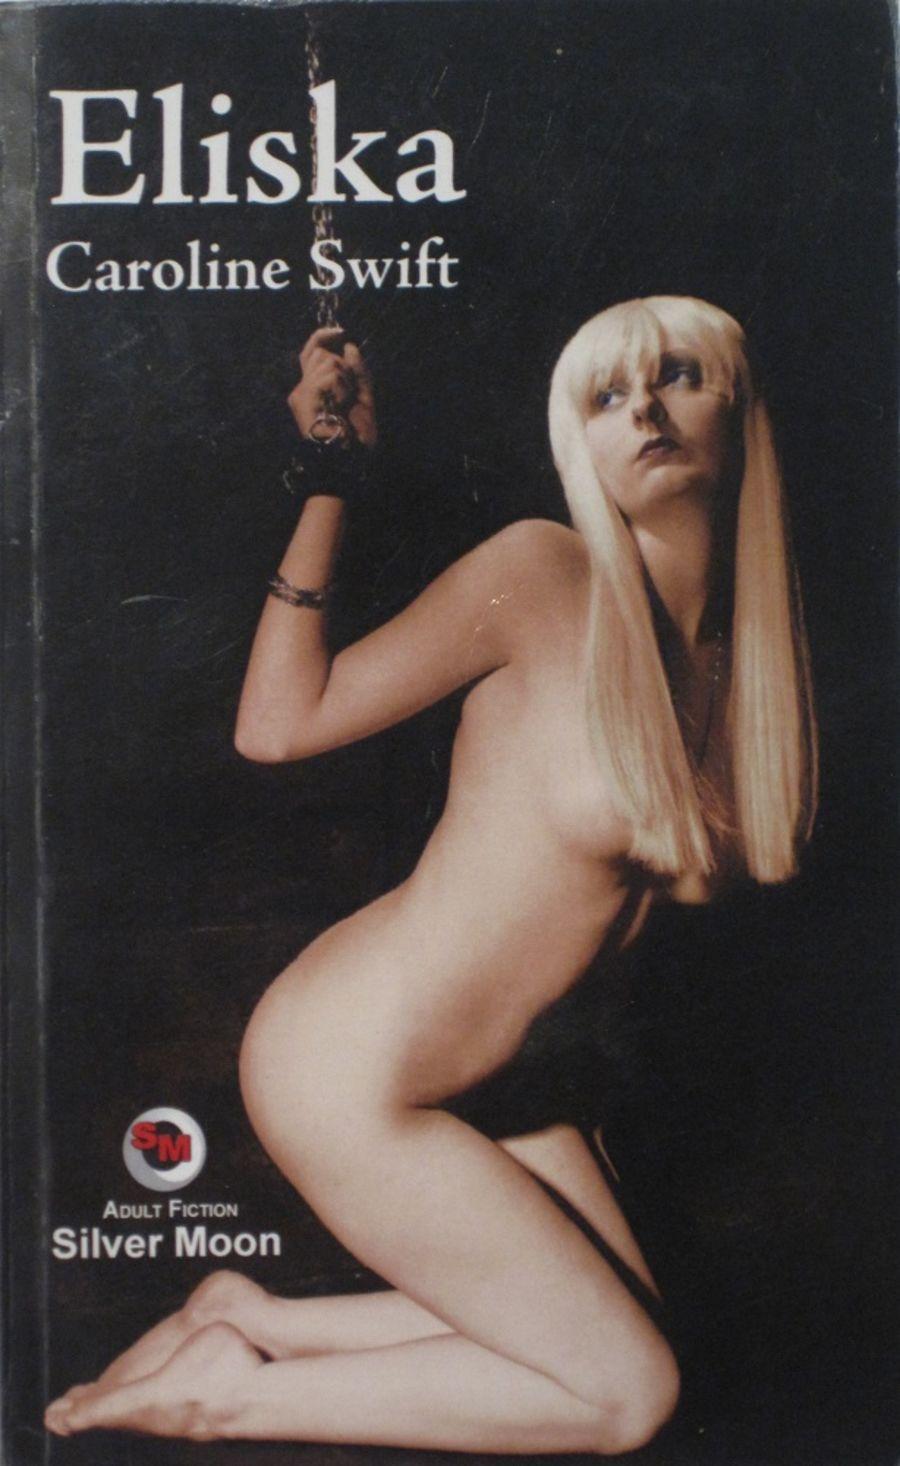 ELISKA.  2009 EROTIC FICTION PAPERBACK BOOK.